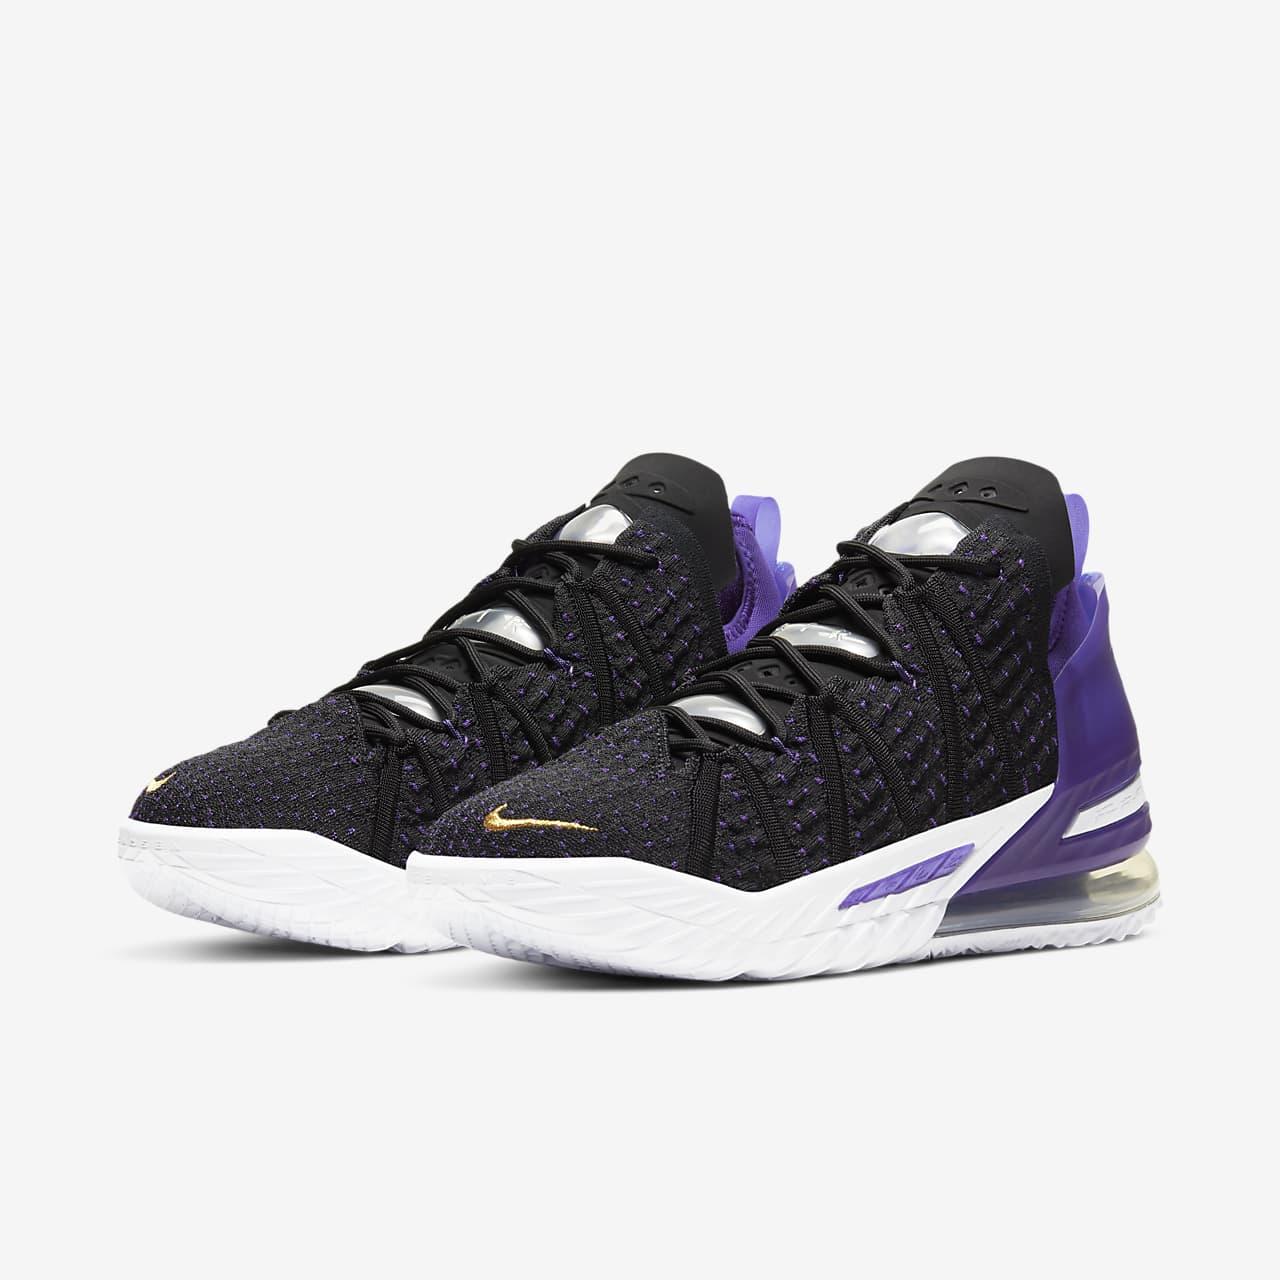 LeBron 18 Basketball Shoe CQ9283-004